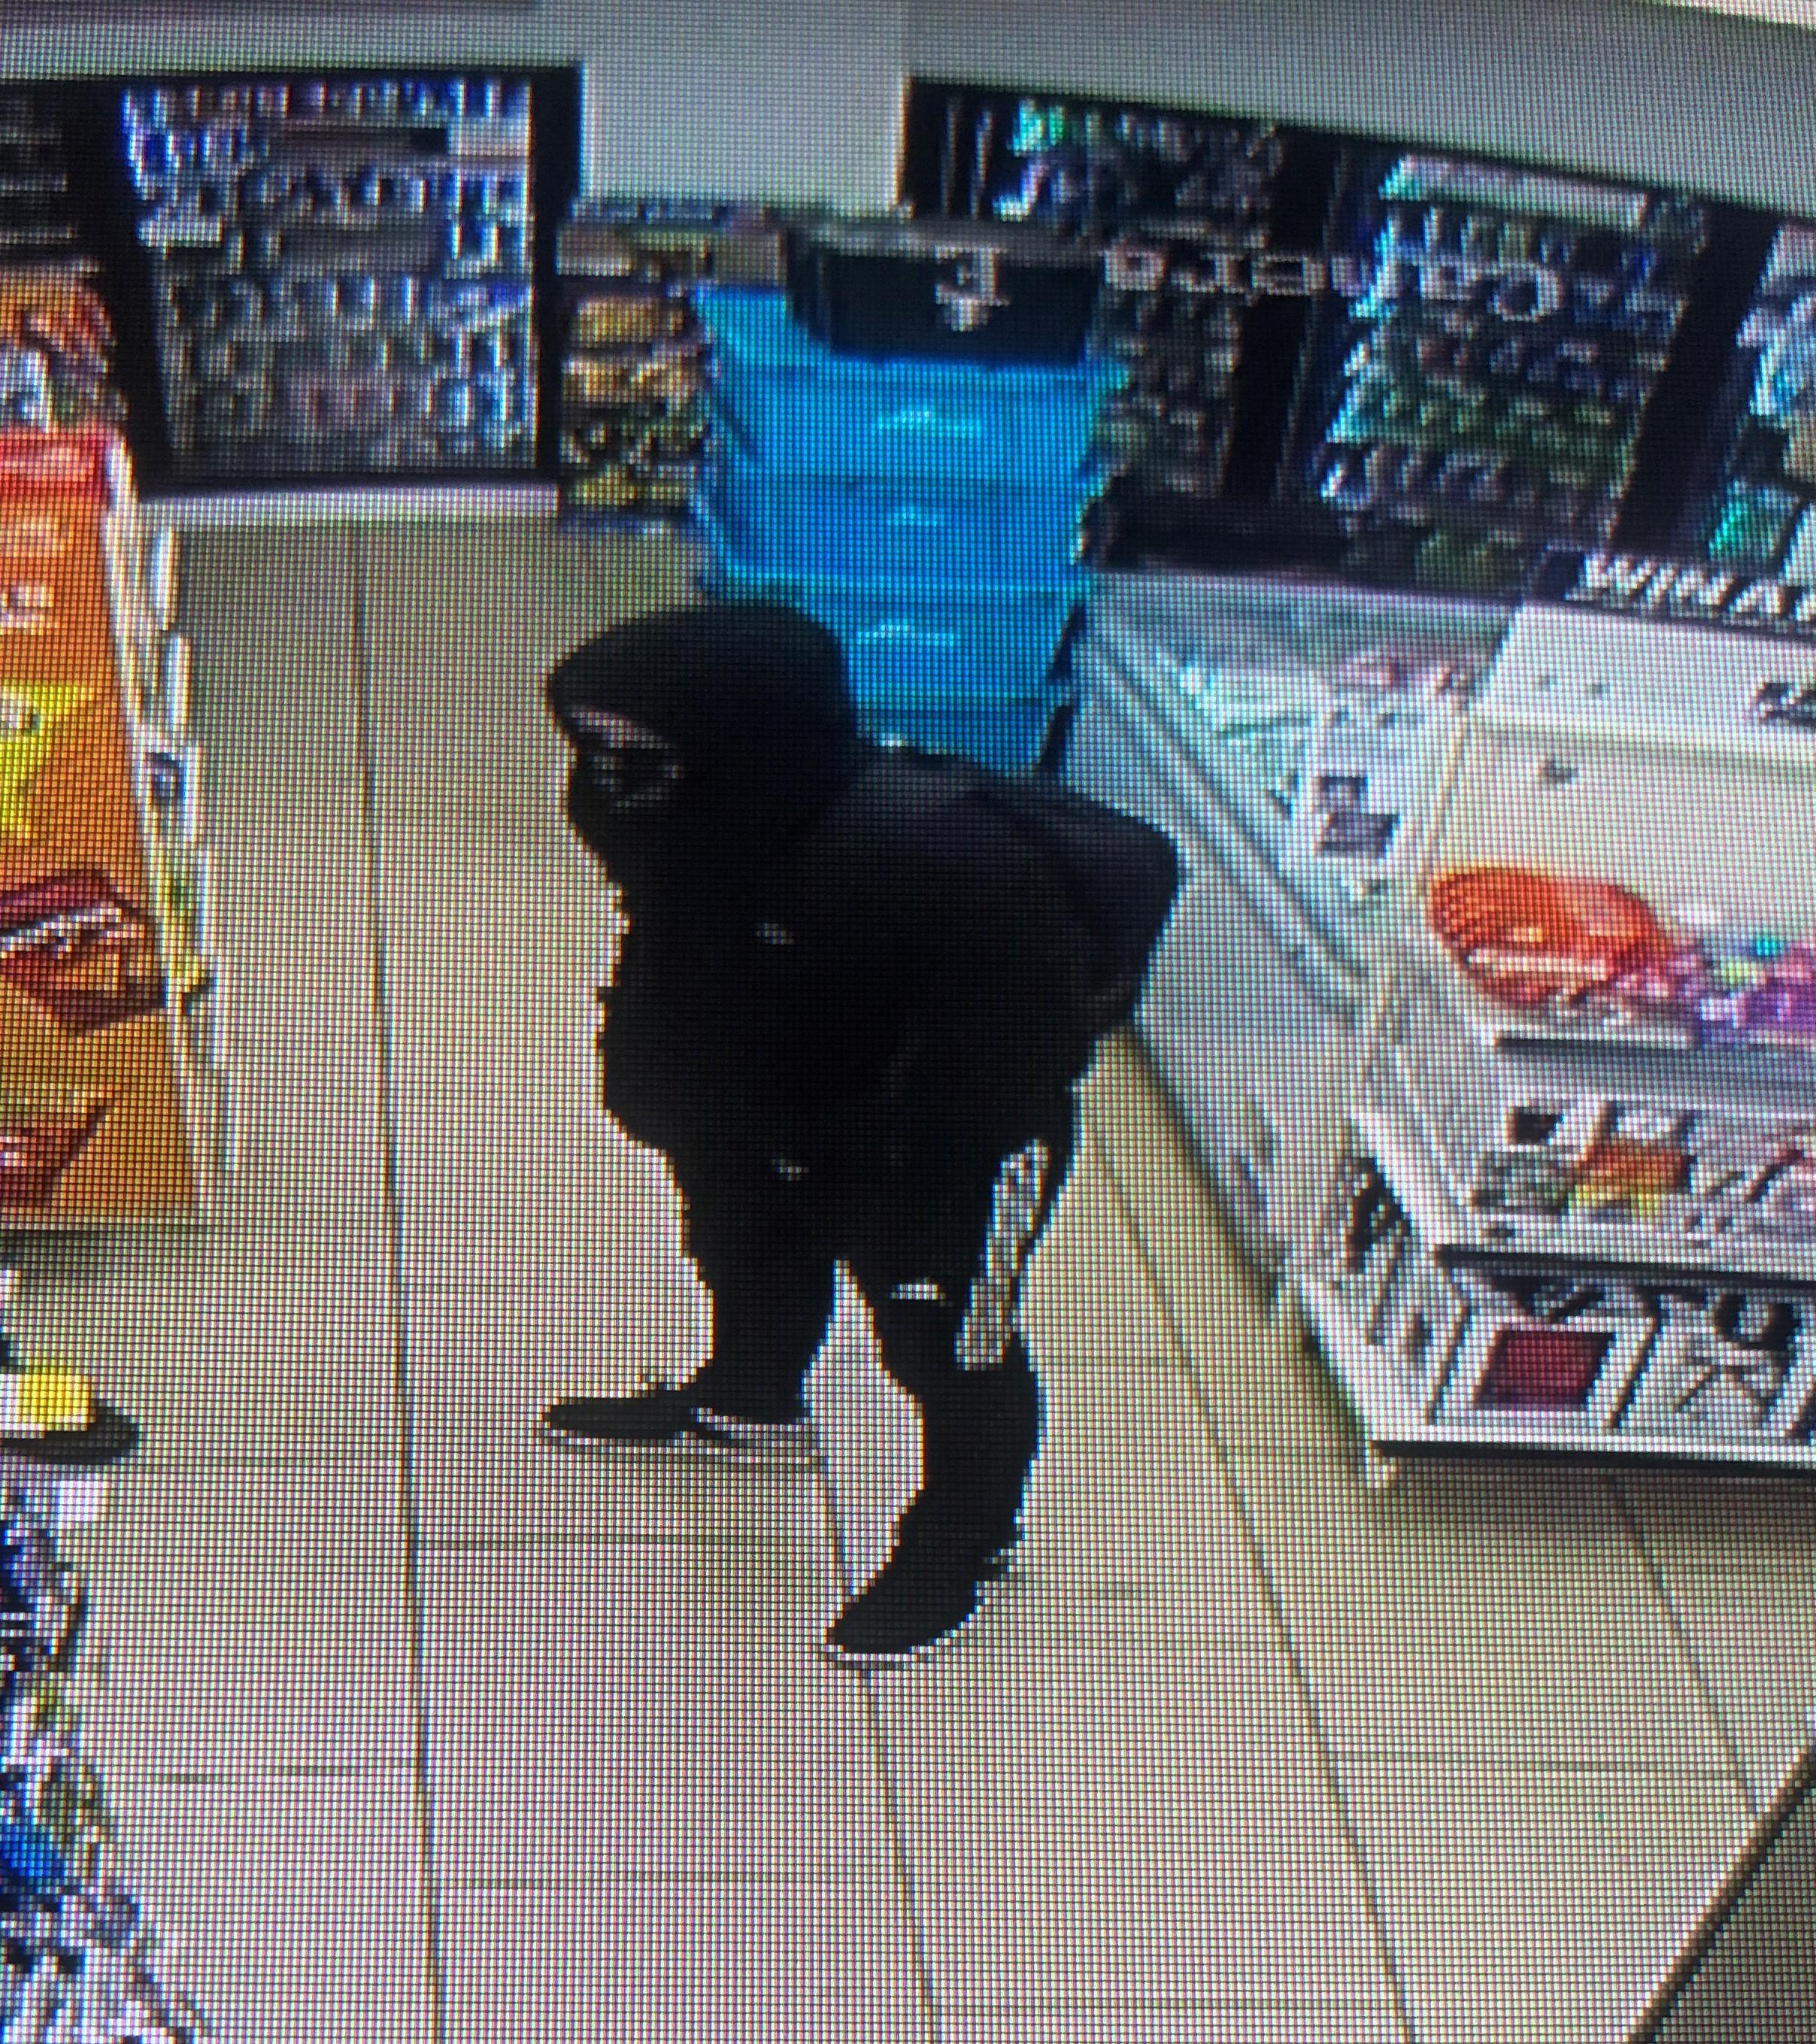 Image 1: Robbery Suspect